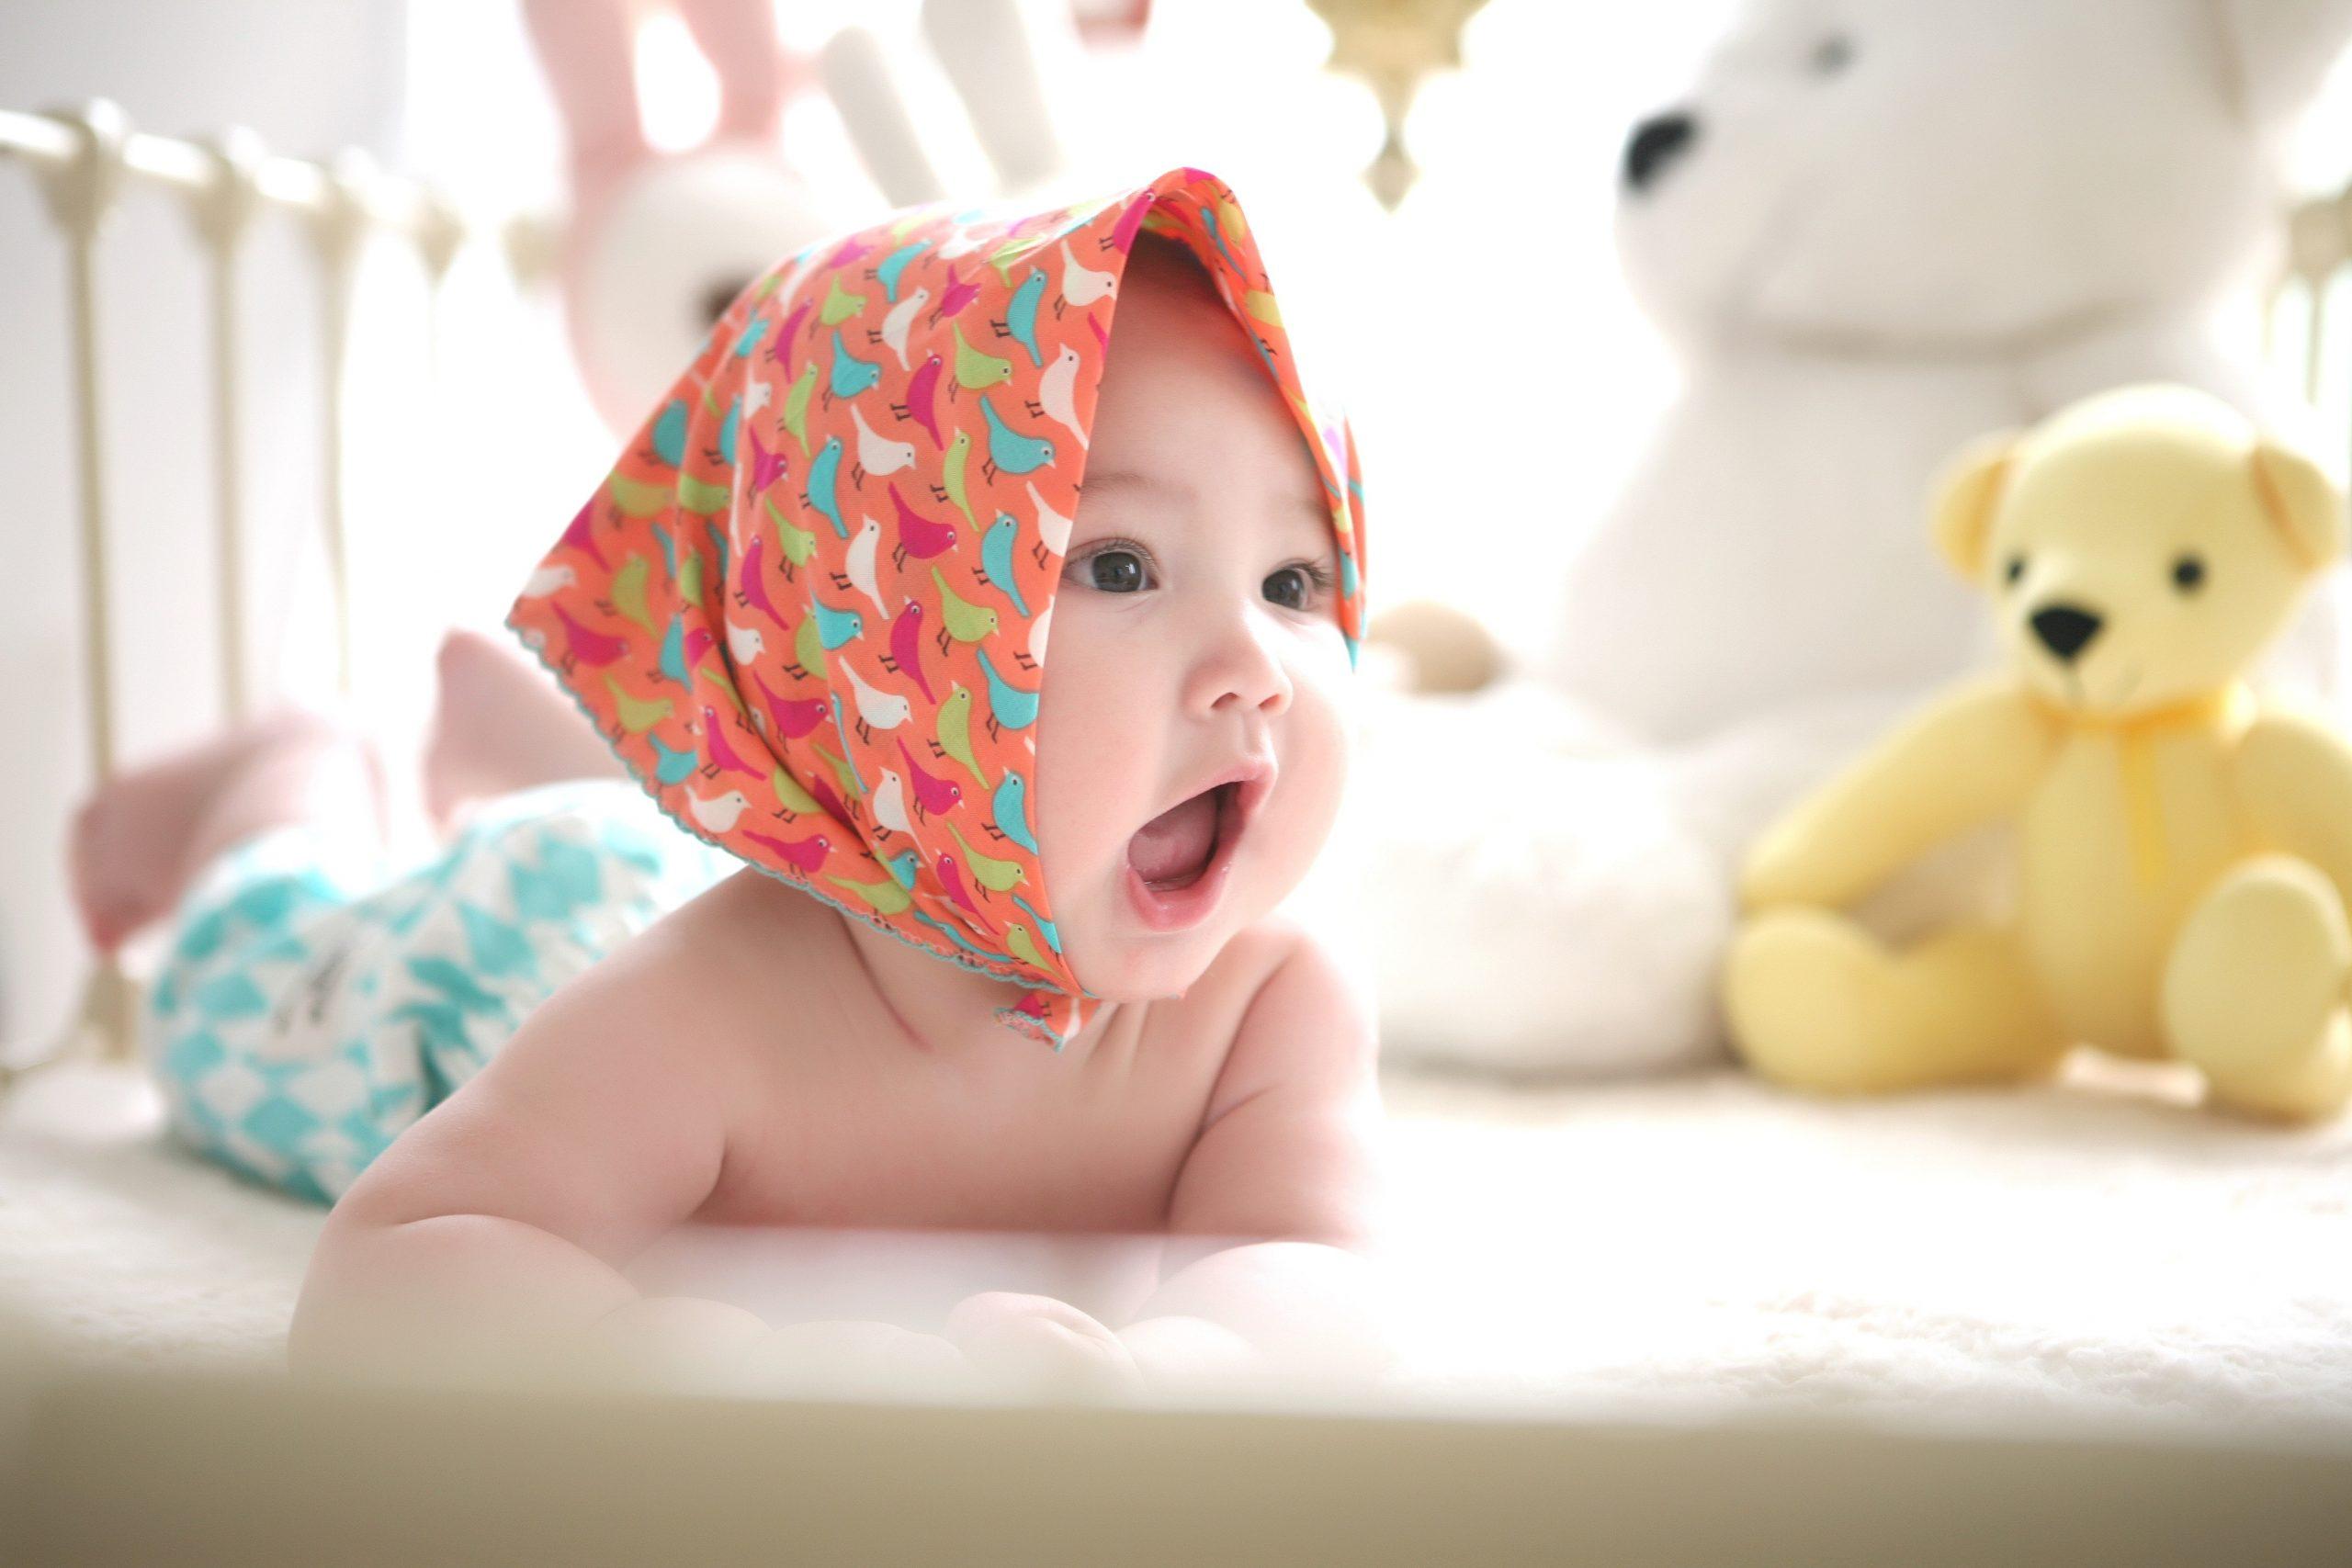 Baby on floor smiling